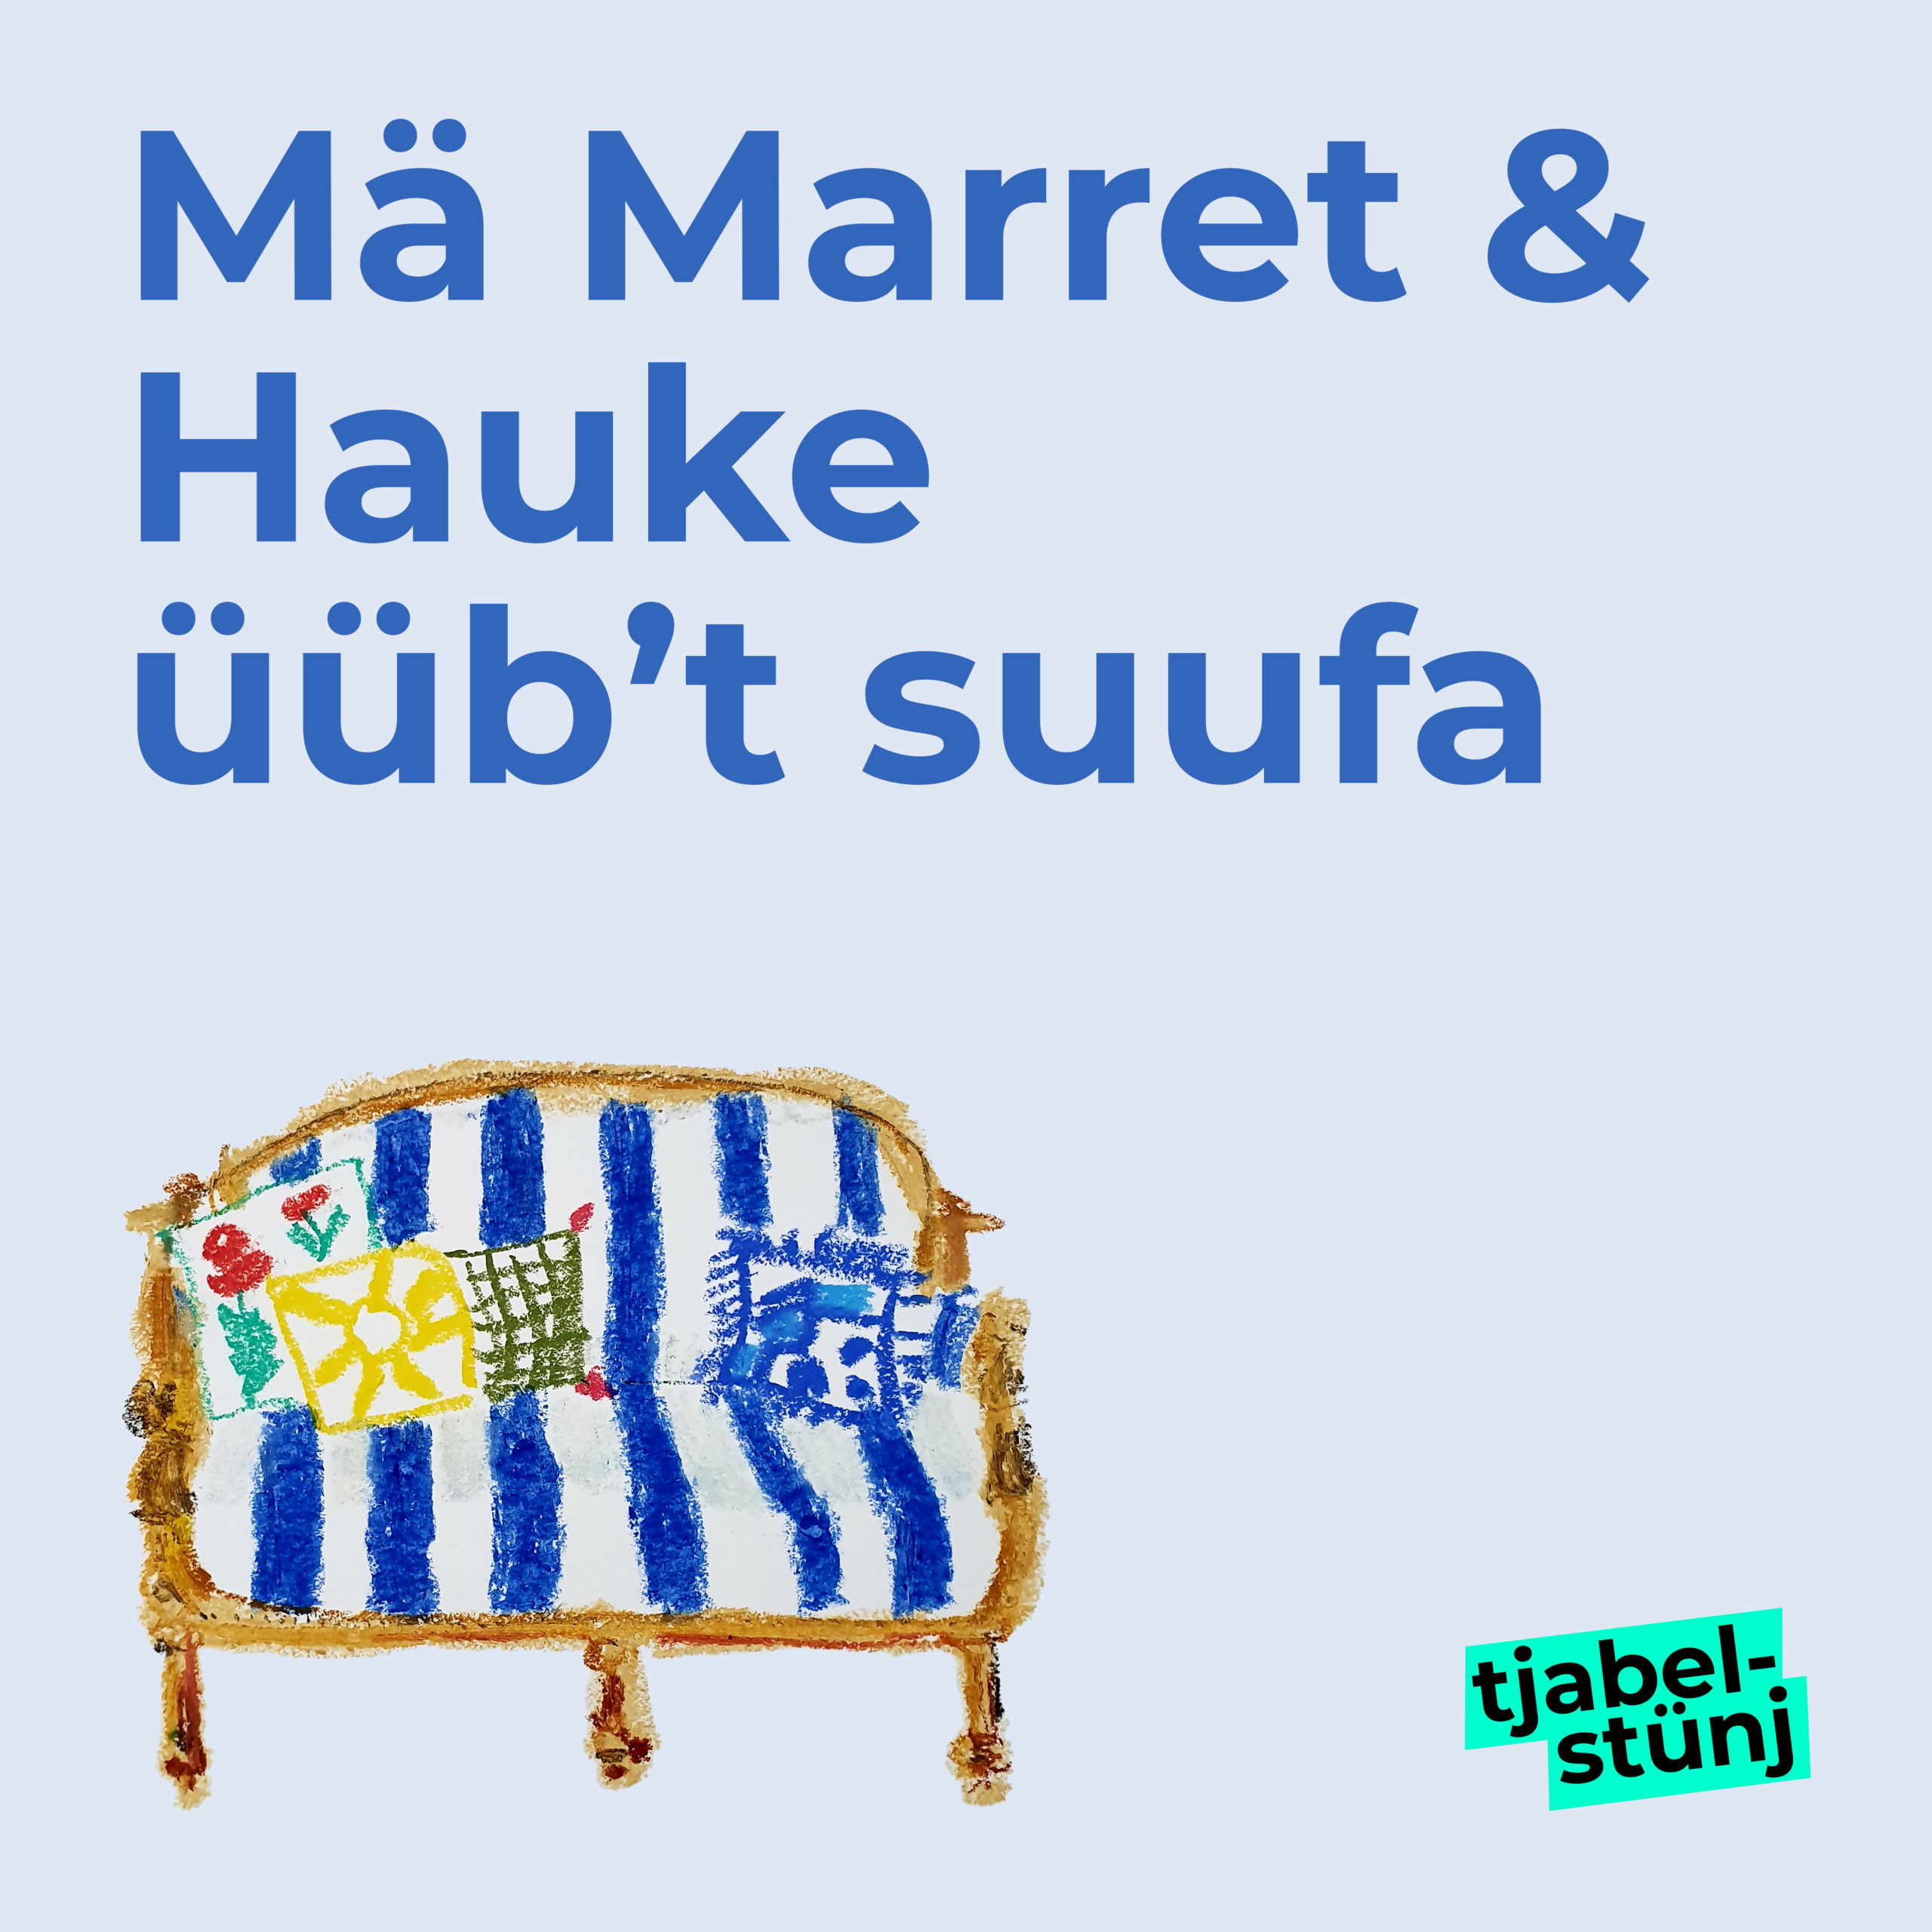 Mä Marret & Hauke üüb't suufa [archiwiaret]